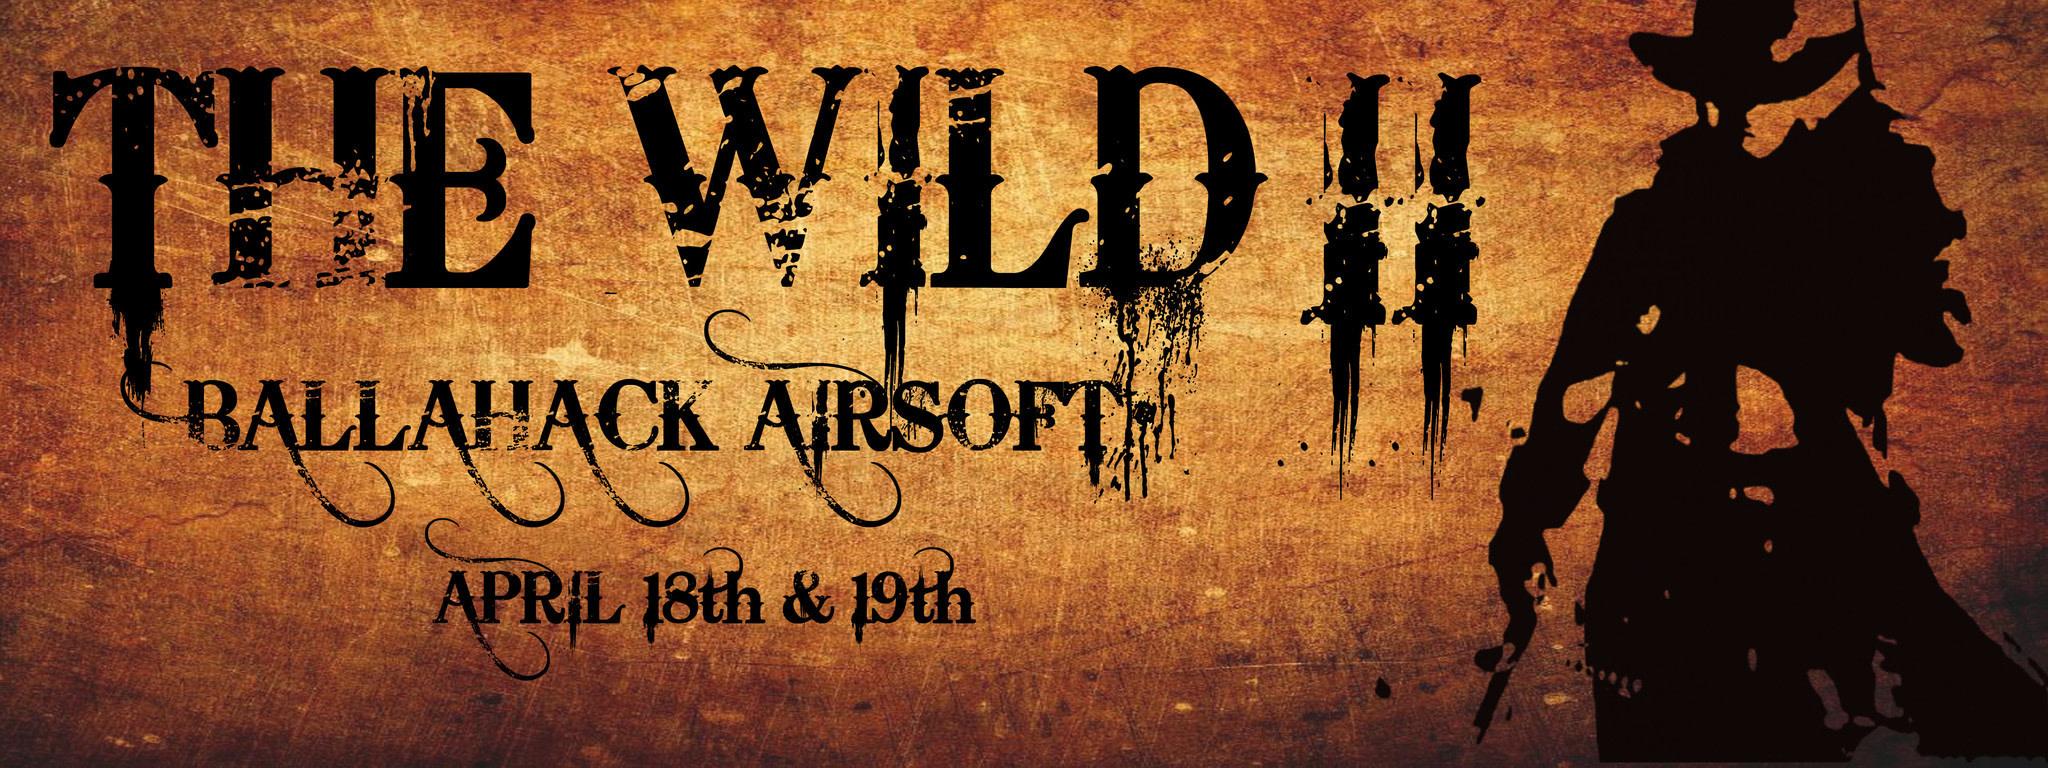 Ballahack Airsoft The Wild II (April 18th-19th, 2020)